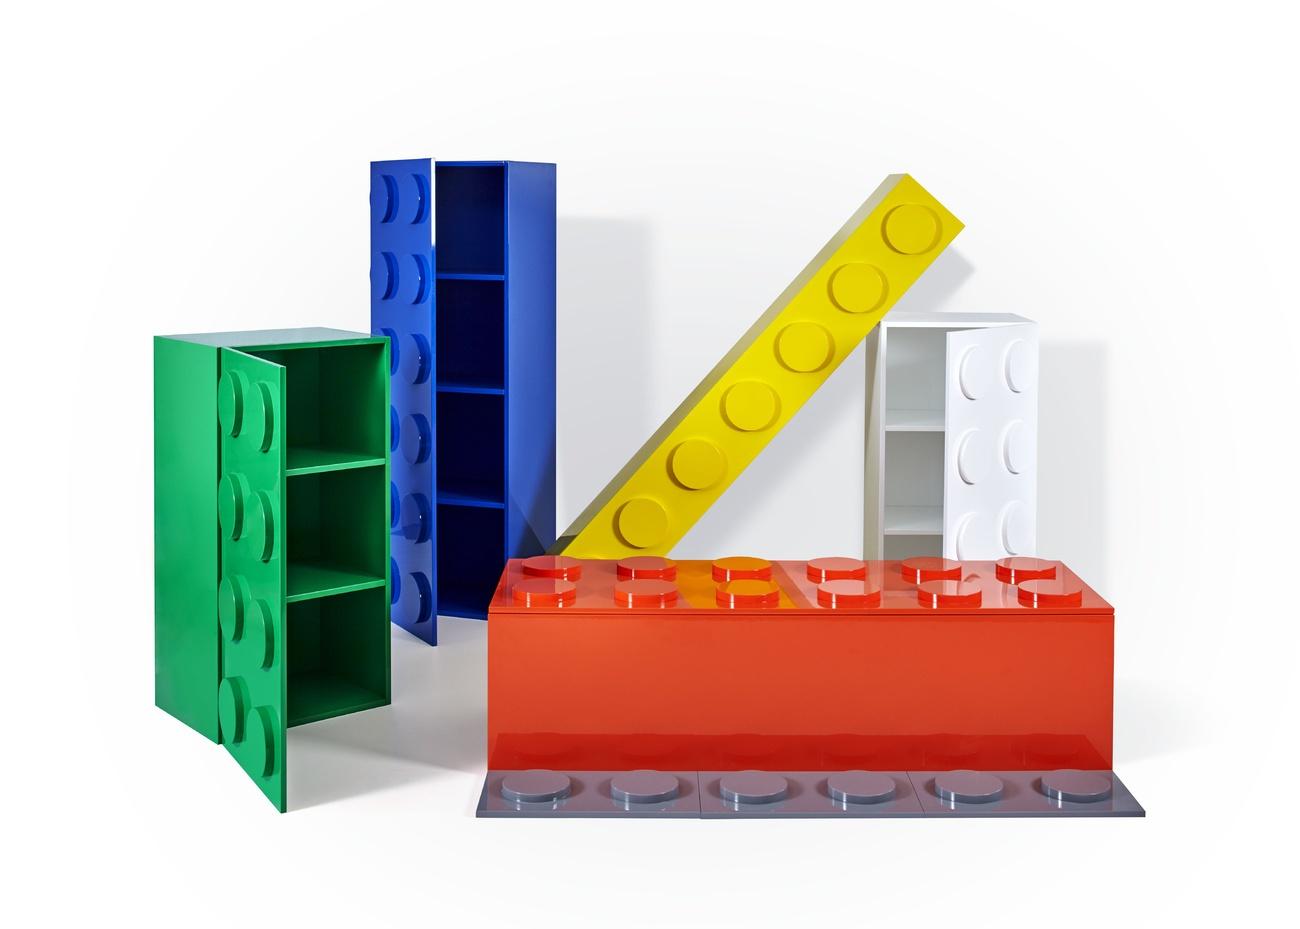 Система хранения Bricks   галерея [1] фото [2]